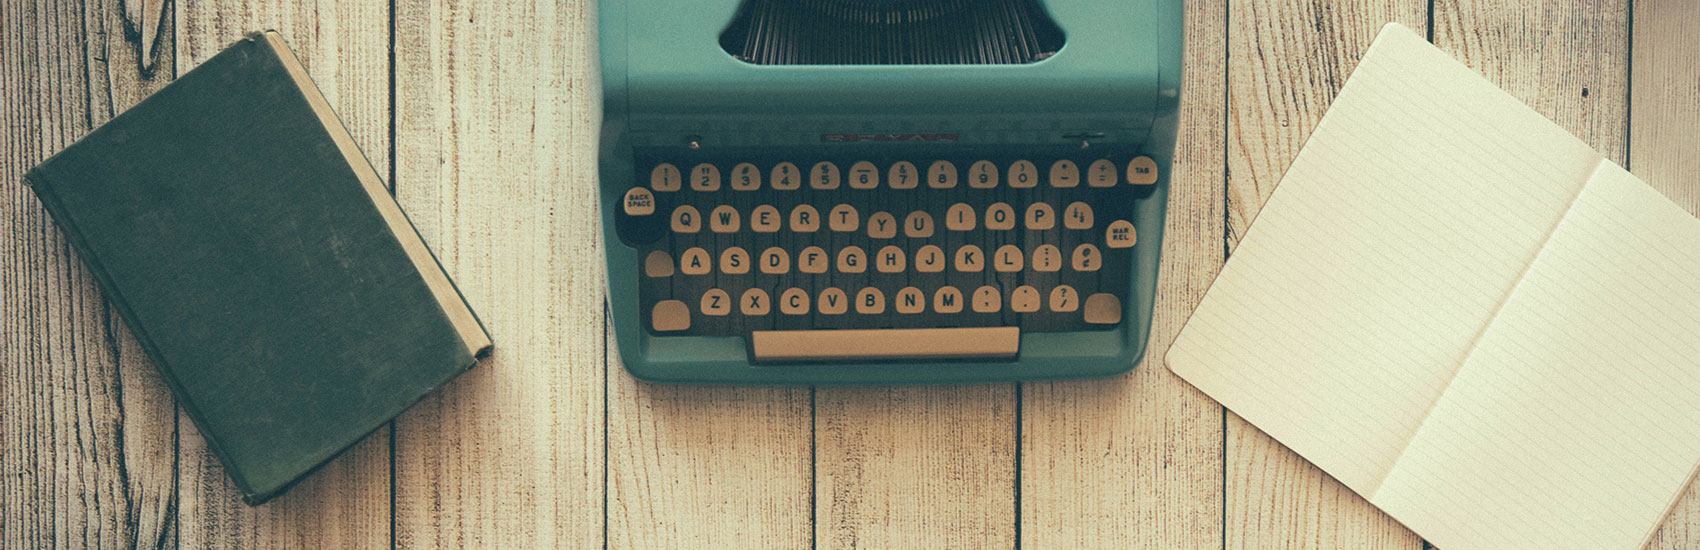 Estrategias eficaces de email marketing